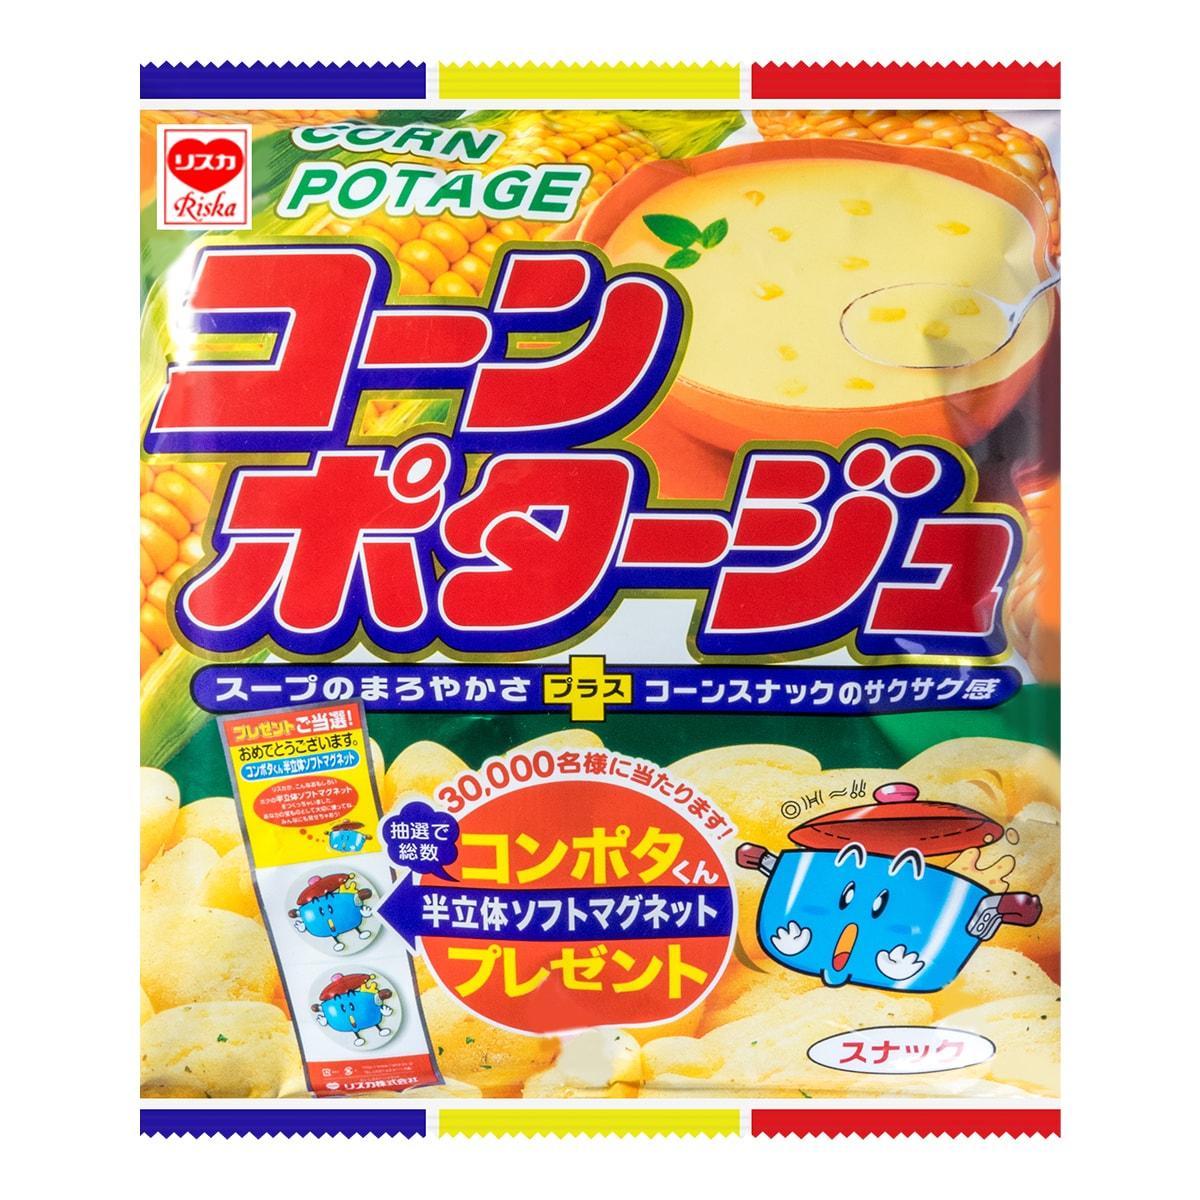 RISKA Corn Potage Snack 75g